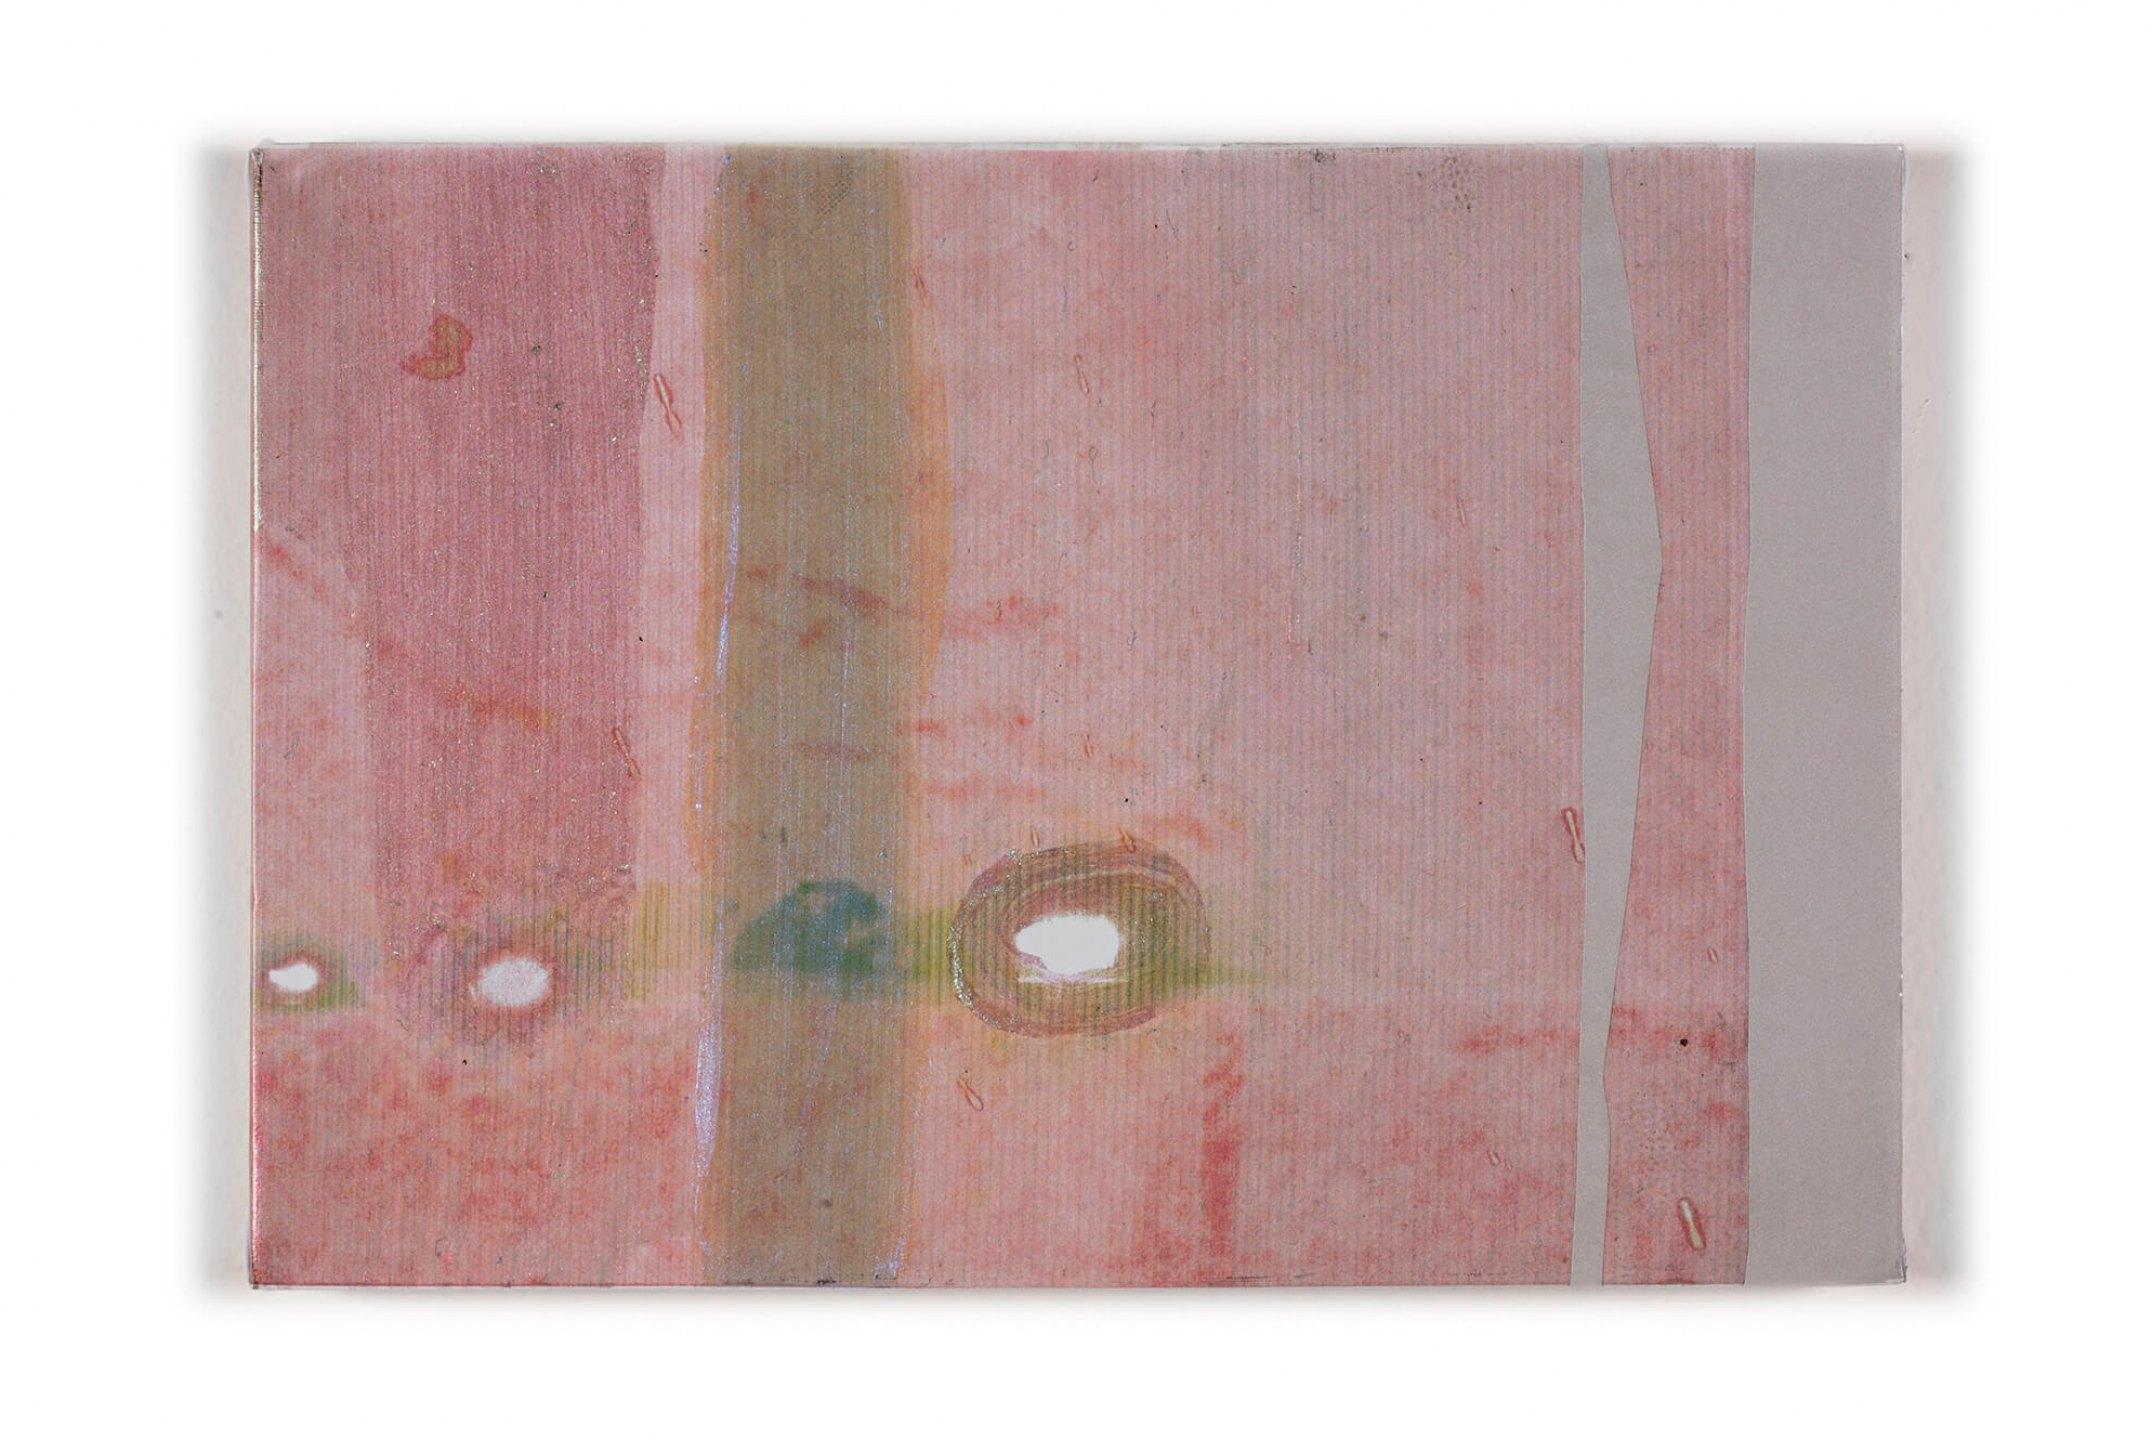 Marina Perez Simão,<em>Untitled</em>, 2013, pigment and reflective on block-out canvas, 35 × 24 cm - Mendes Wood DM